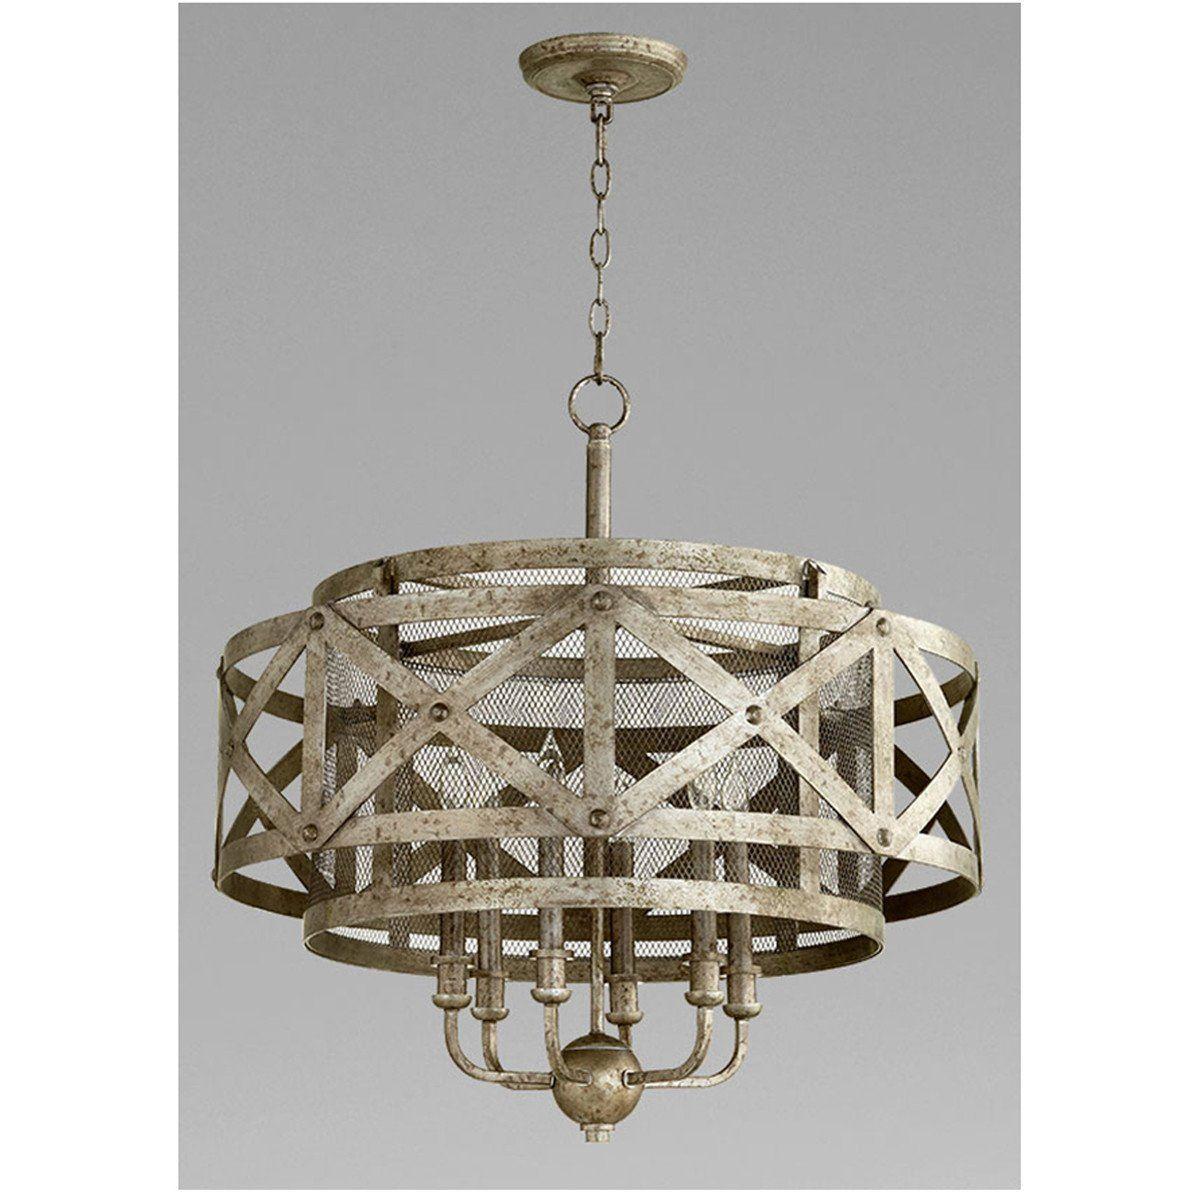 Cyan Design Byzantine Metal Pendant | Byzantine, Metals and Pendants